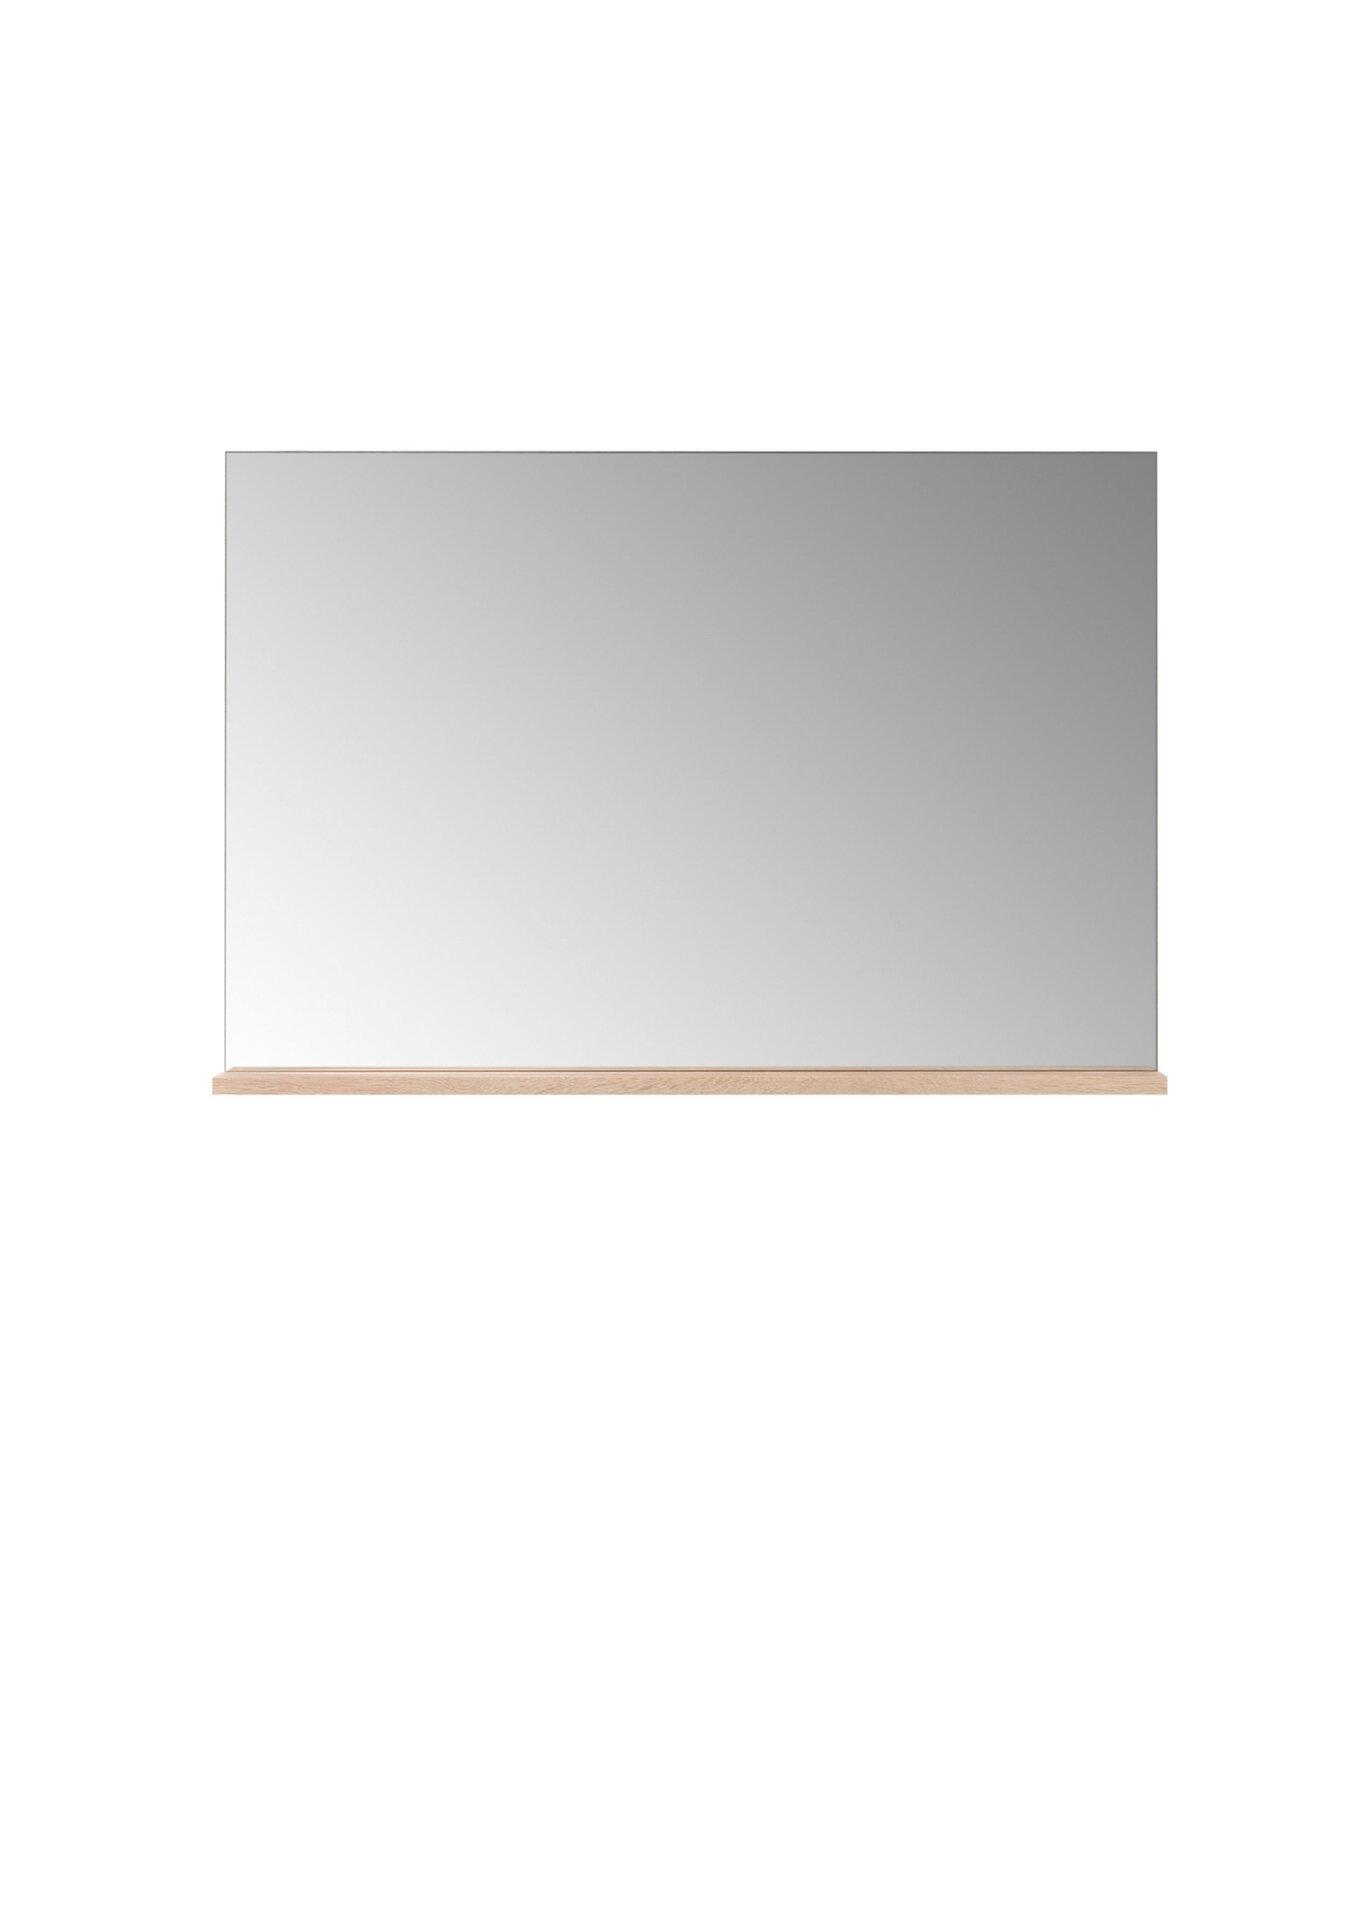 Spiegel LOBBY Vito Holzwerkstoff mehrfarbig 12 x 68 x 100 cm